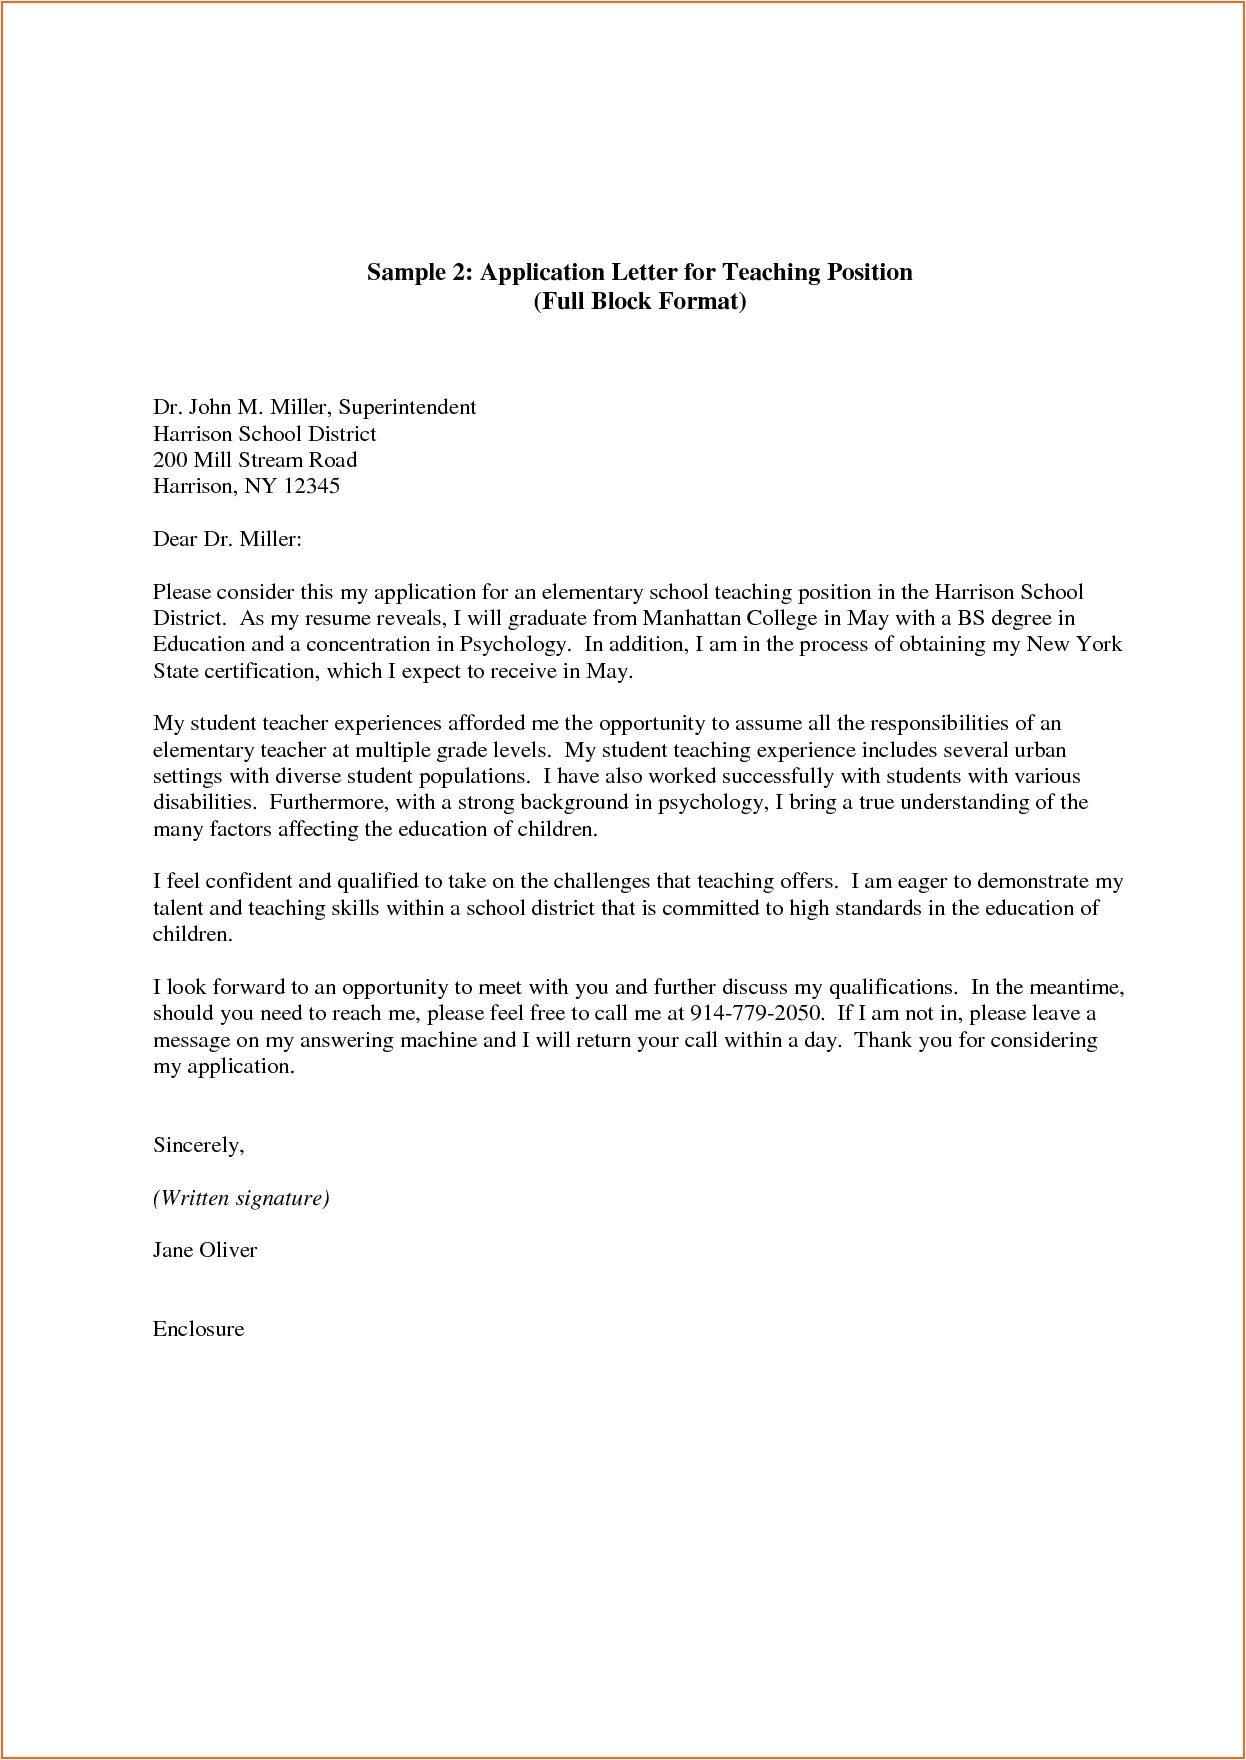 Applying for A Teaching Job Cover Letter Application Letter Template for Teaching Job